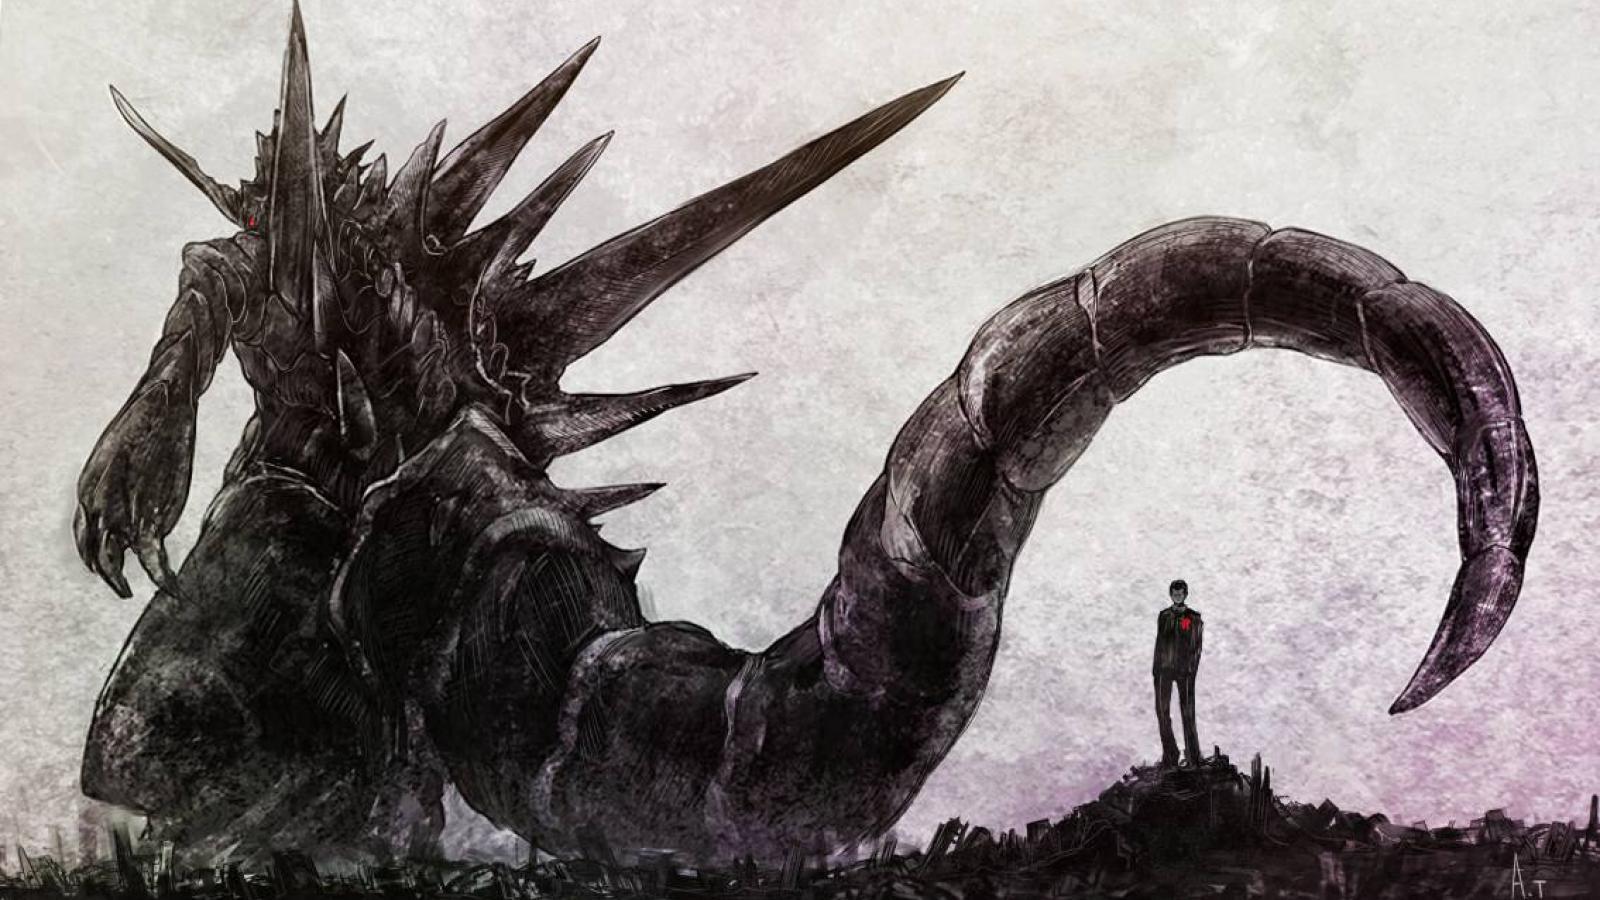 Godzilla 2014 HD desktop wallpaper : Fullscreen